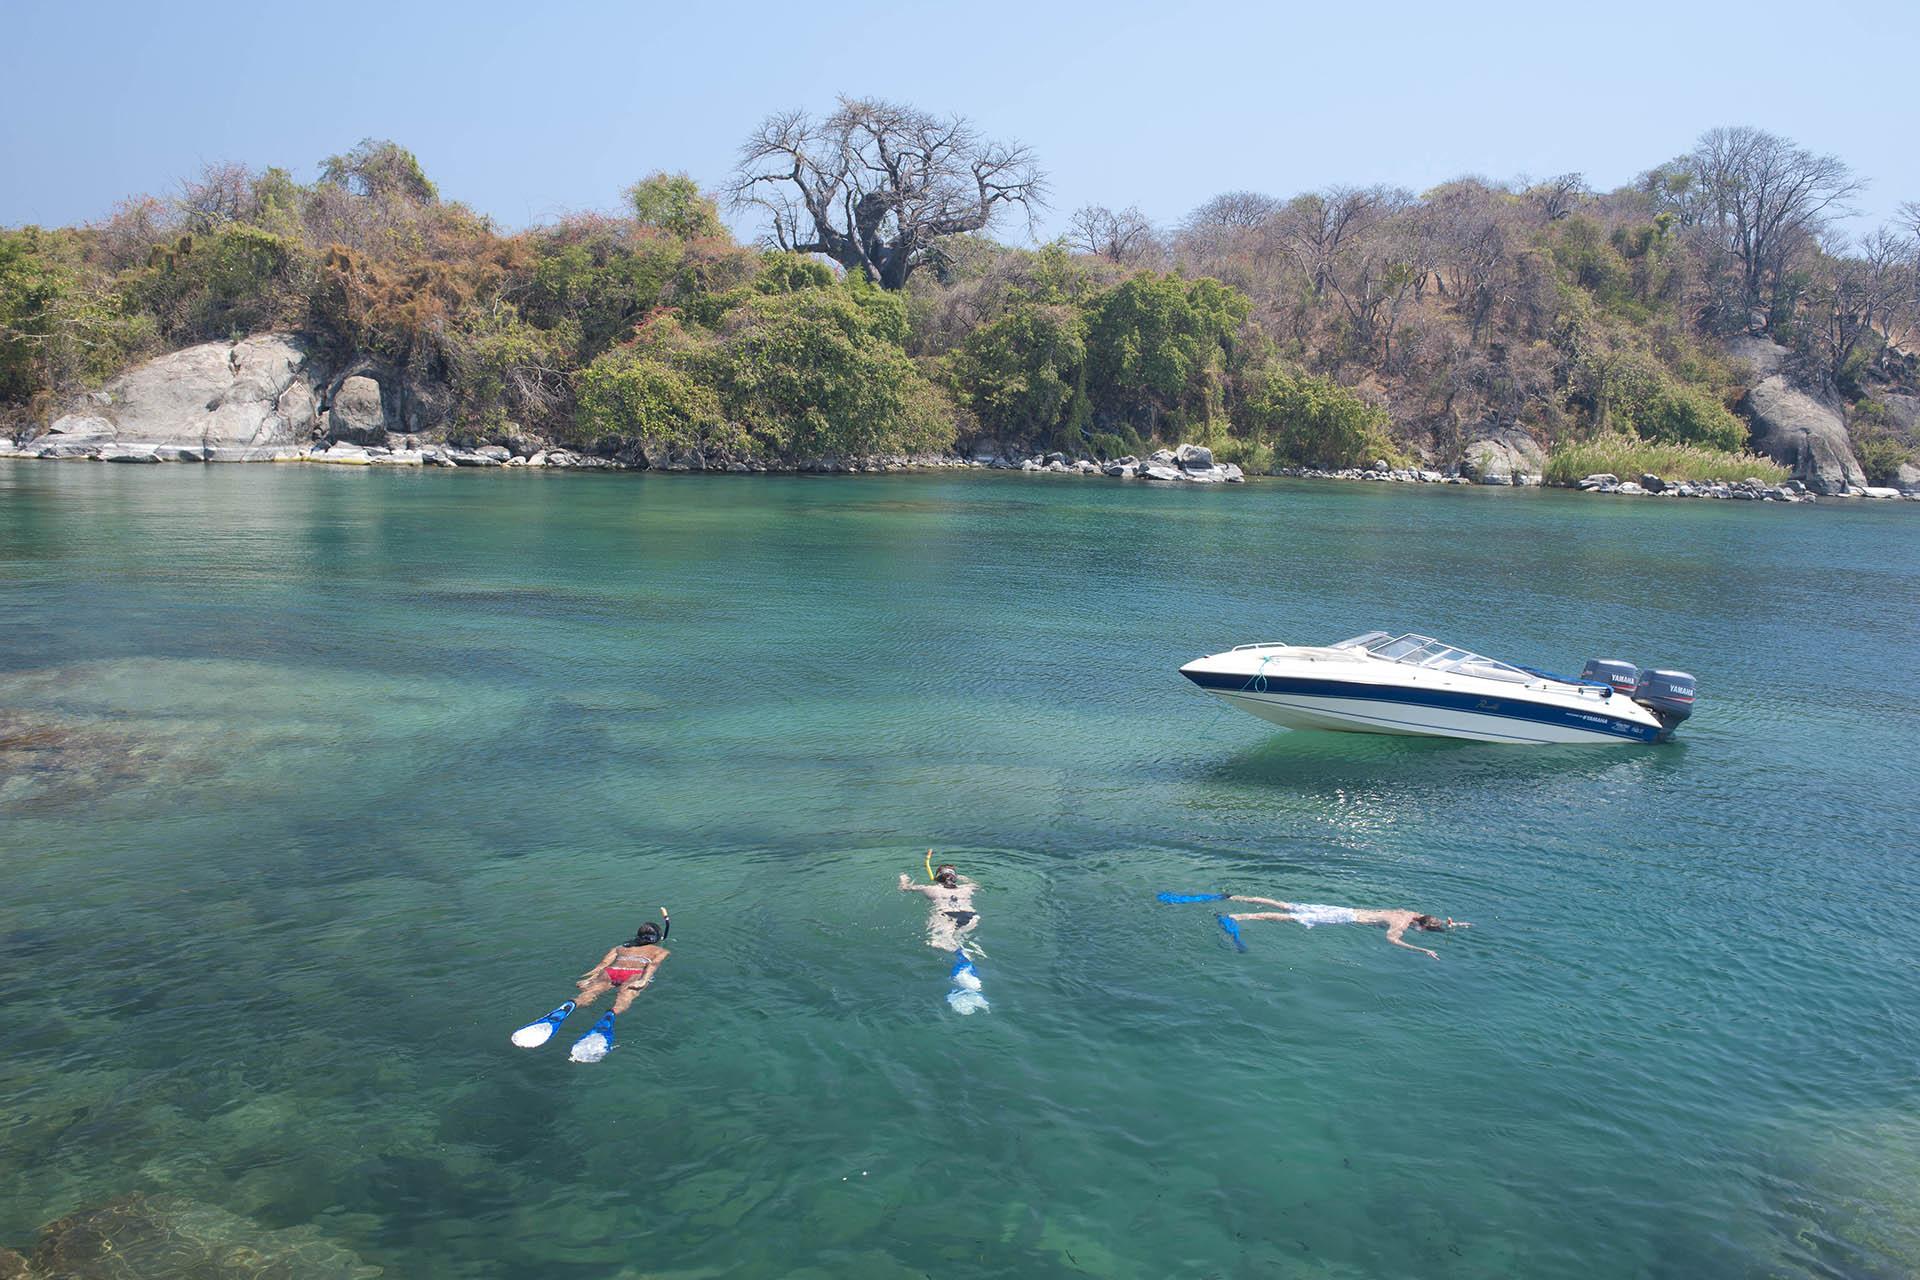 bush beach safaris wet-wild-south-luangwa-lake-malawi-11-nights-tours-malawian-style-malawi-adventures-experiences-specialist-tour-operator-swimming-pumulani